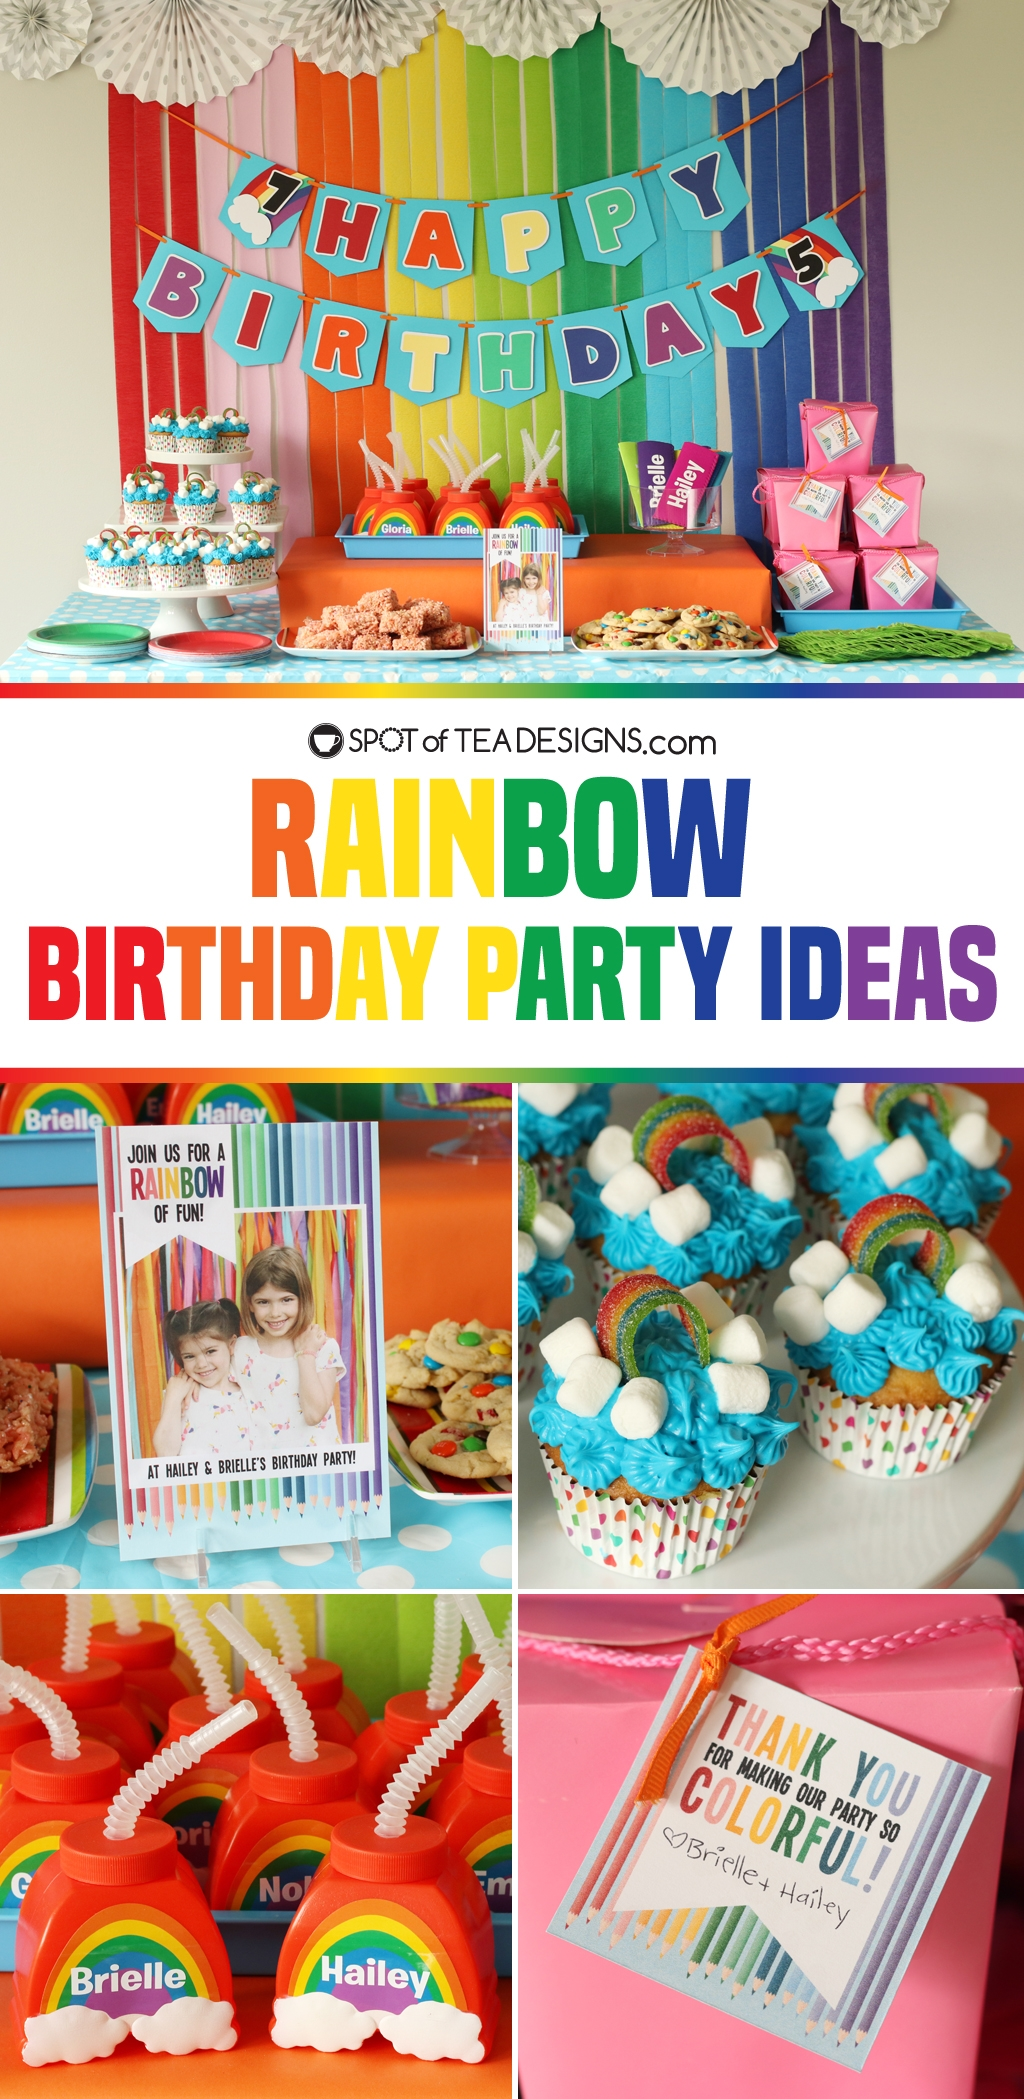 Rainbow birthday party ideas for decor, food and favors! | spotofteadesigns.com